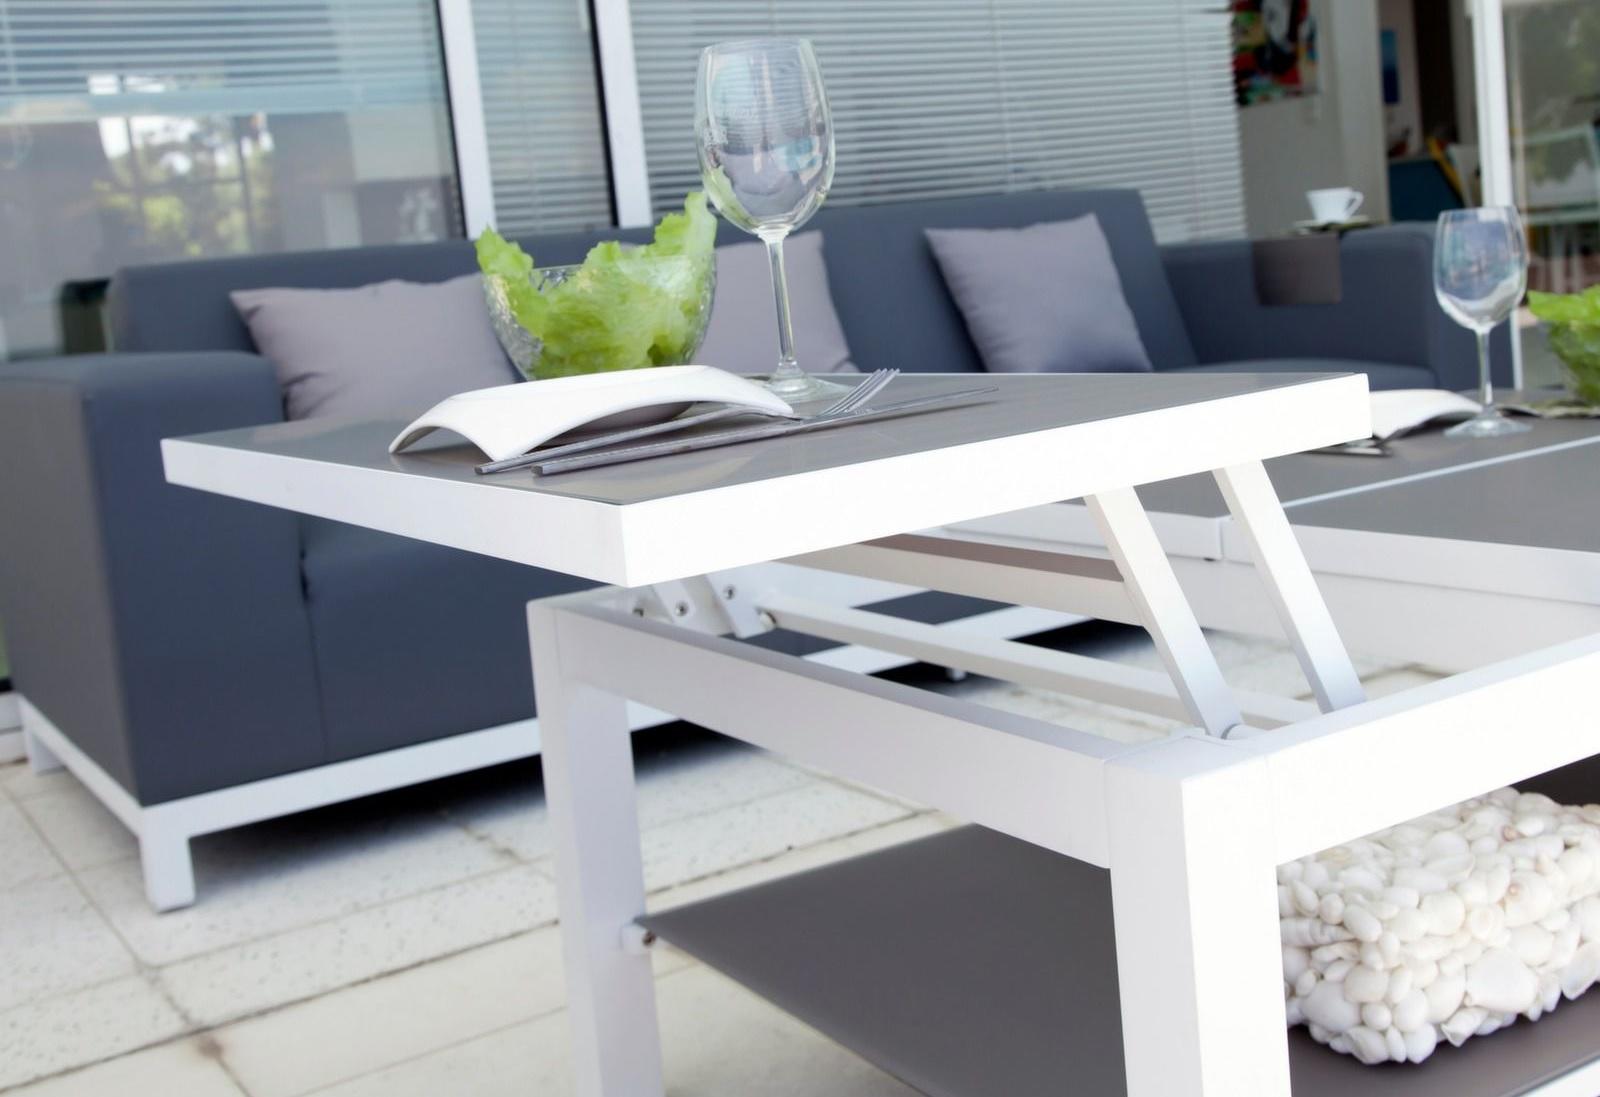 gu ridon table basse et table roulante solutions pour. Black Bedroom Furniture Sets. Home Design Ideas